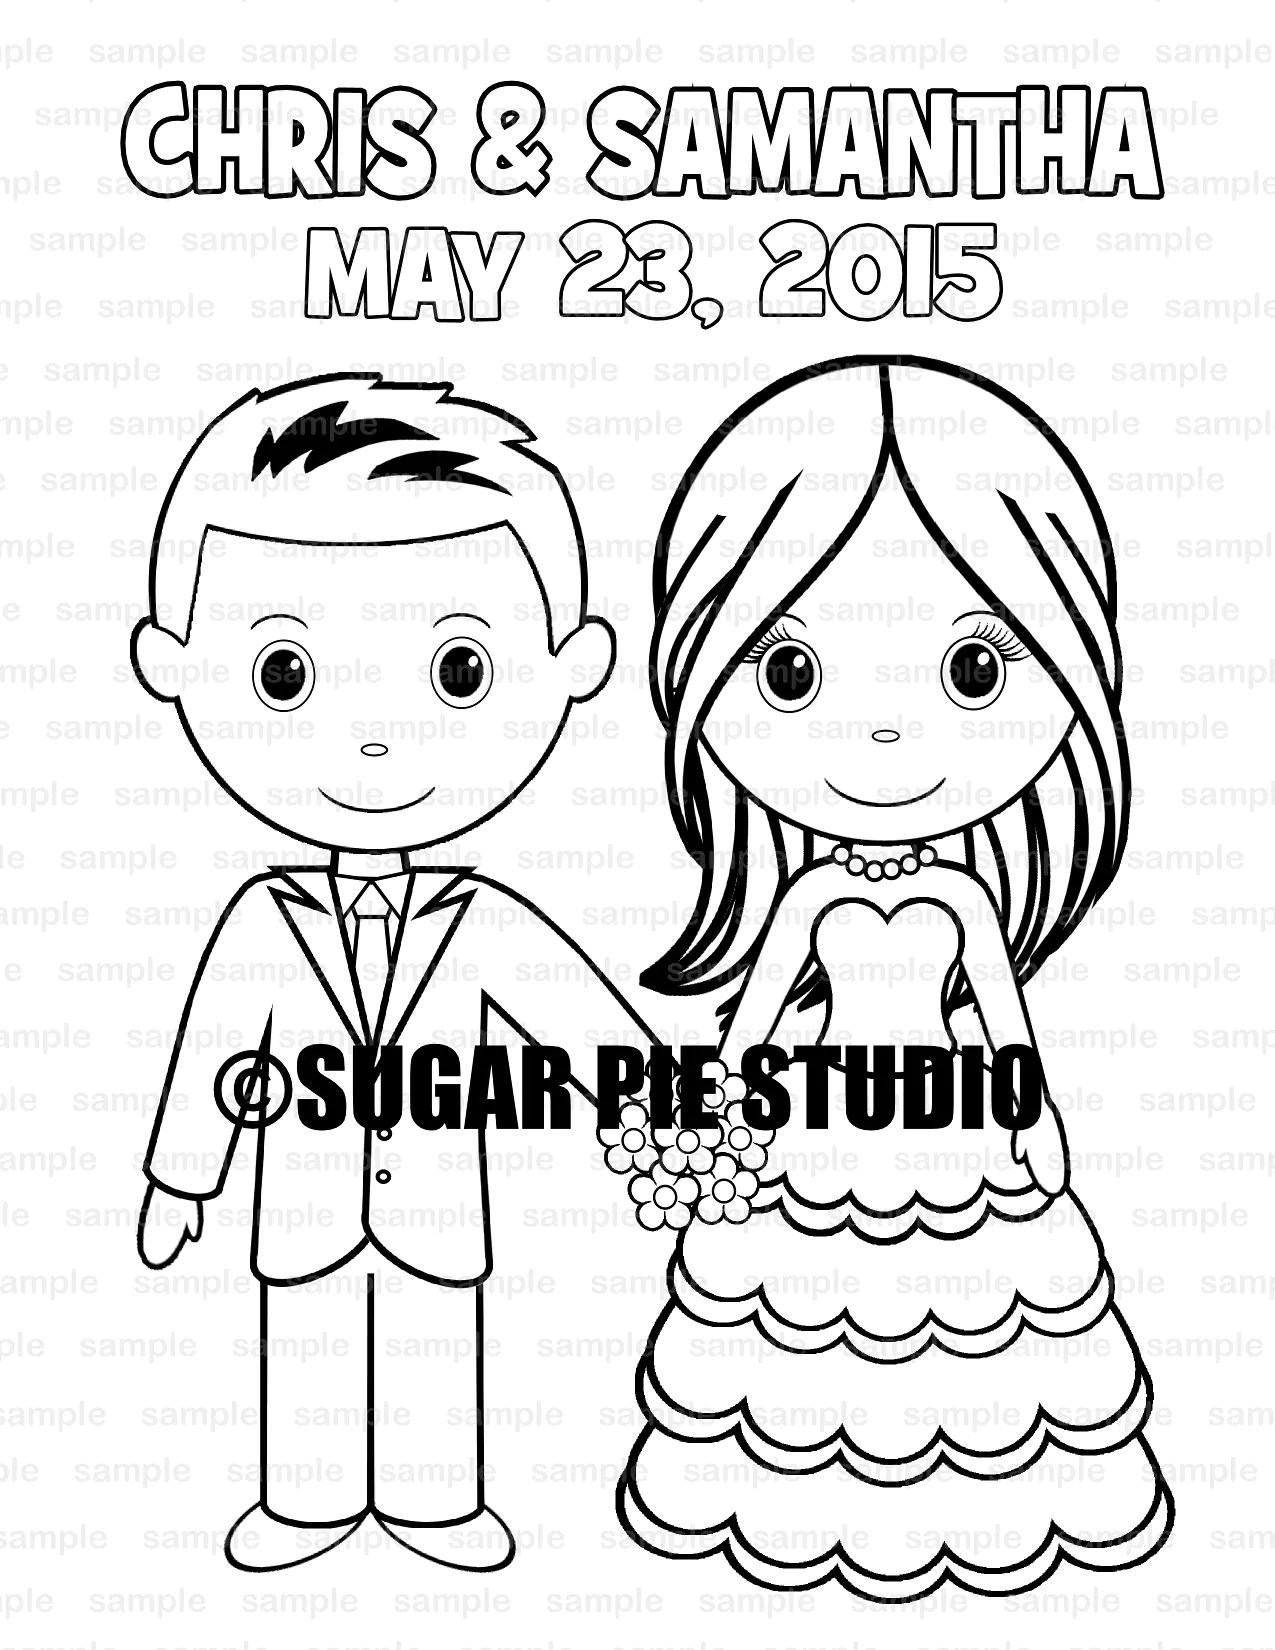 Wedding coloring book activity Favor Kids 8.5 x 11 PDF or